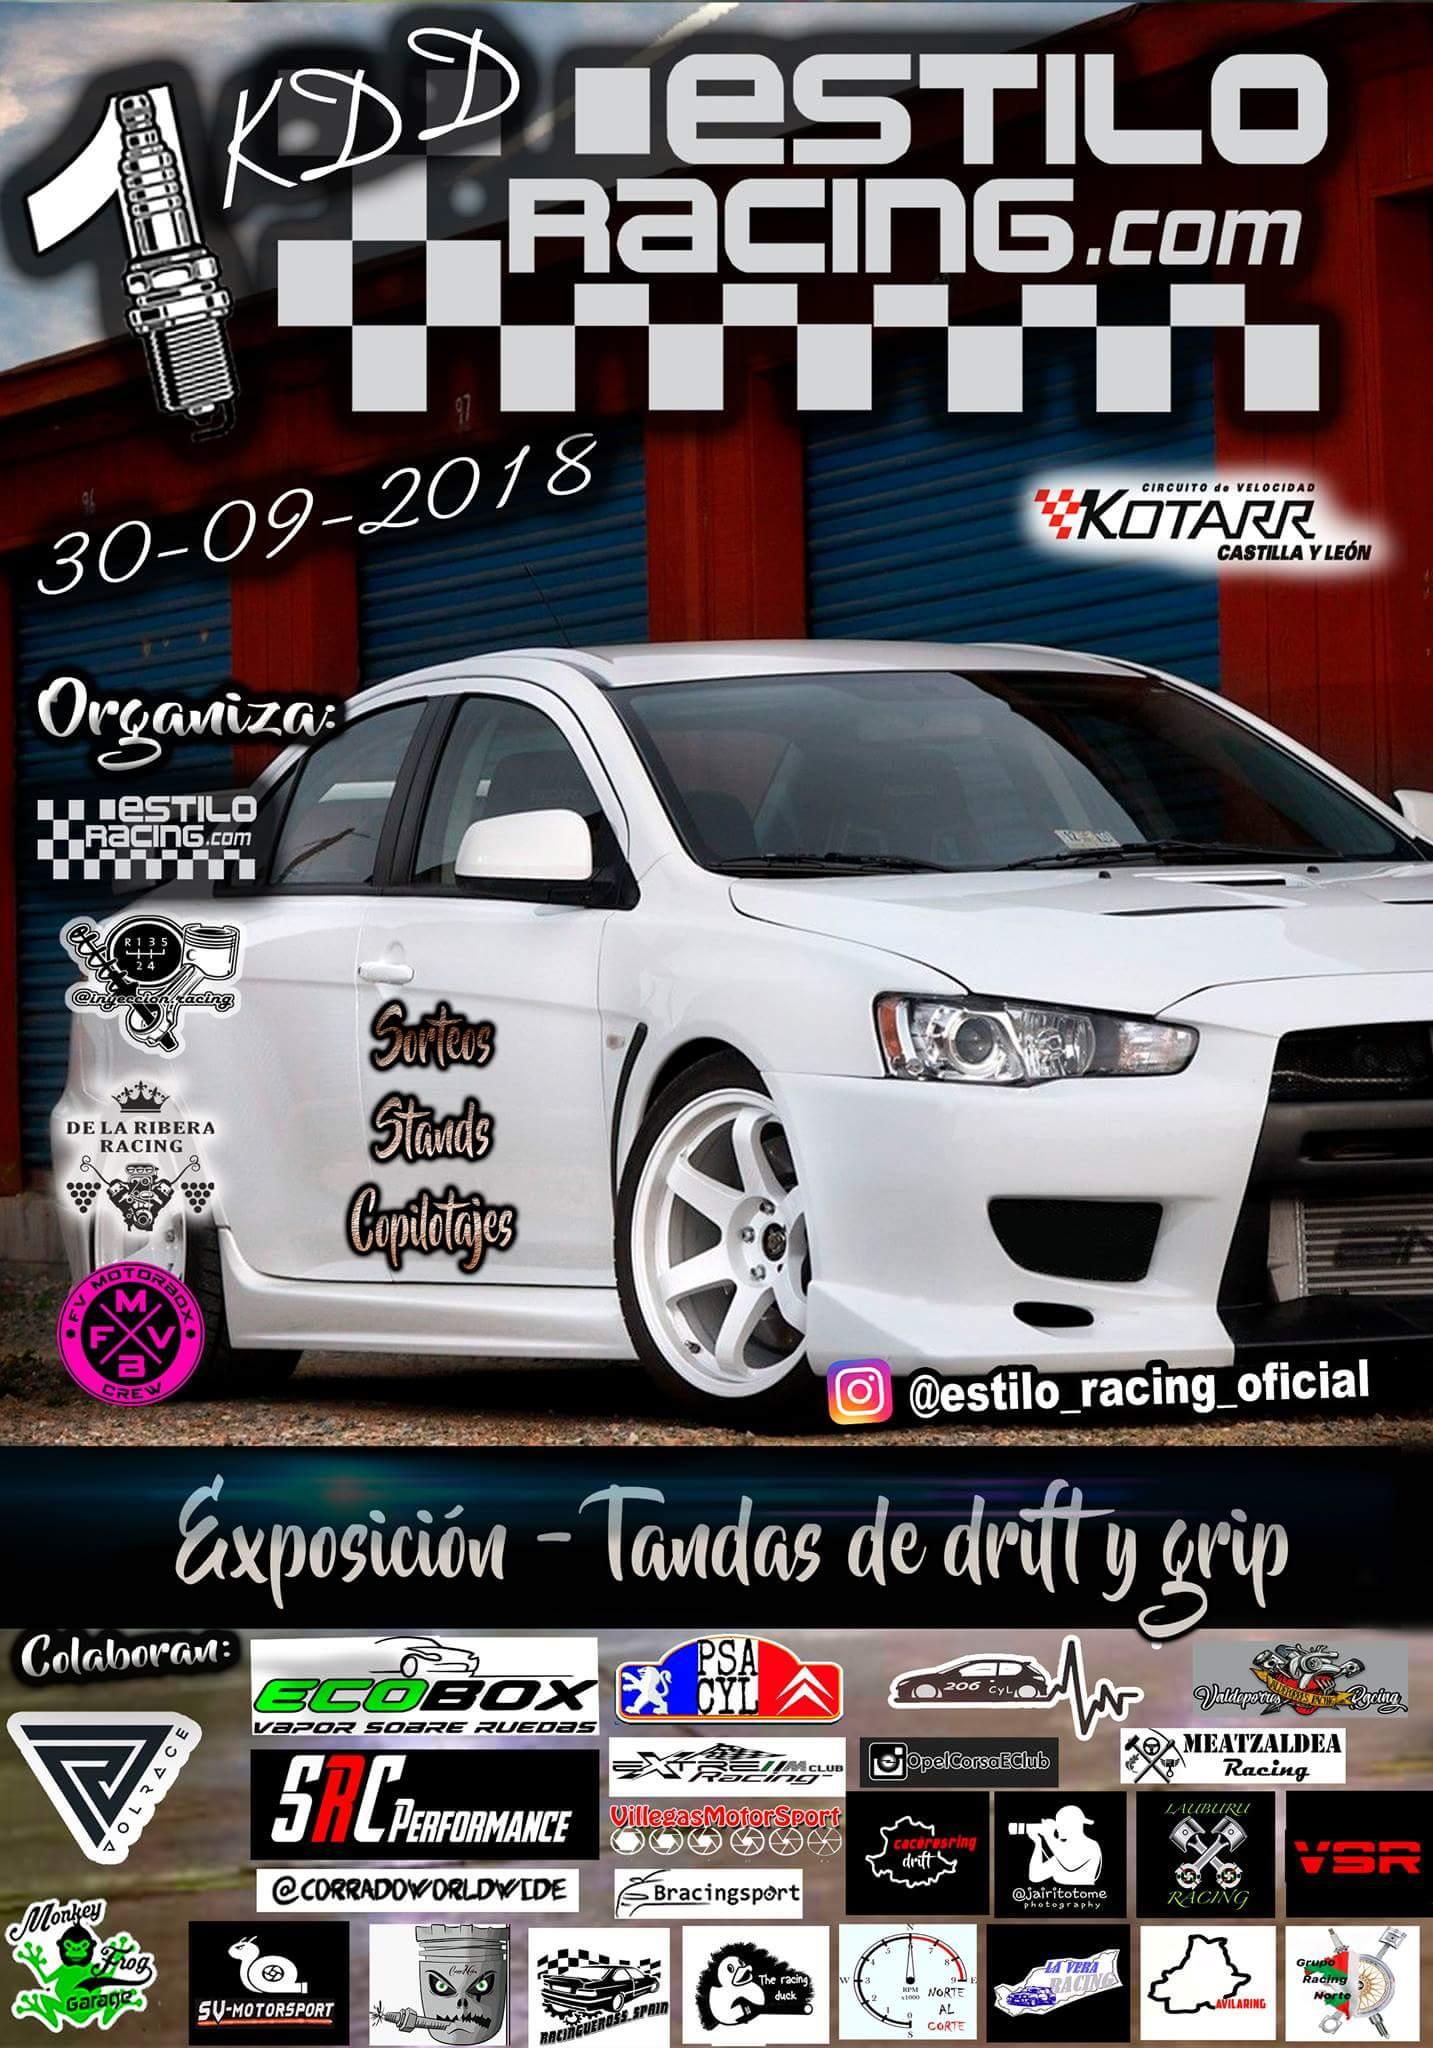 Circuito Fk1 : Circuito kotarr